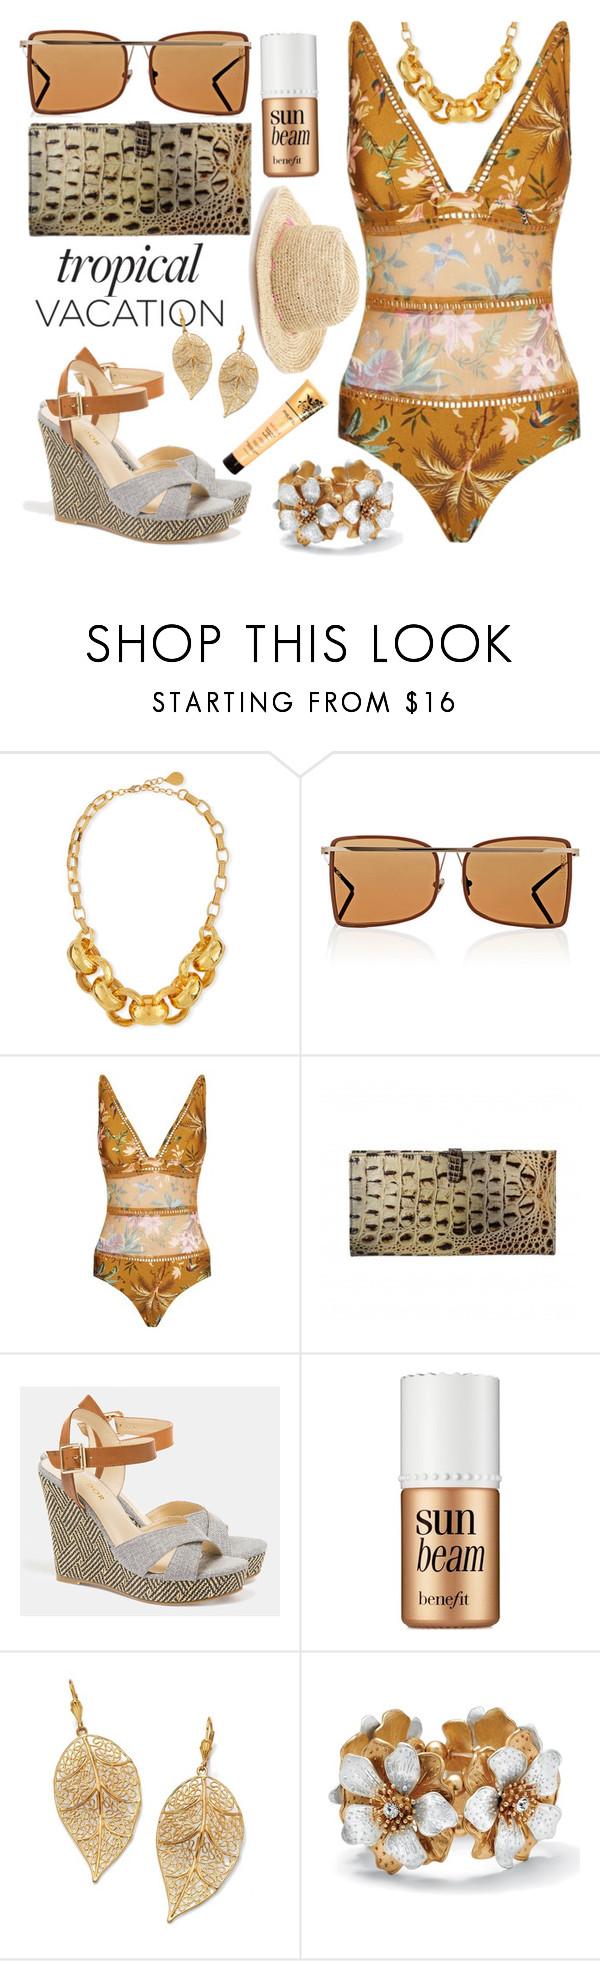 25++ Palm beach jewelry catalog phone number info